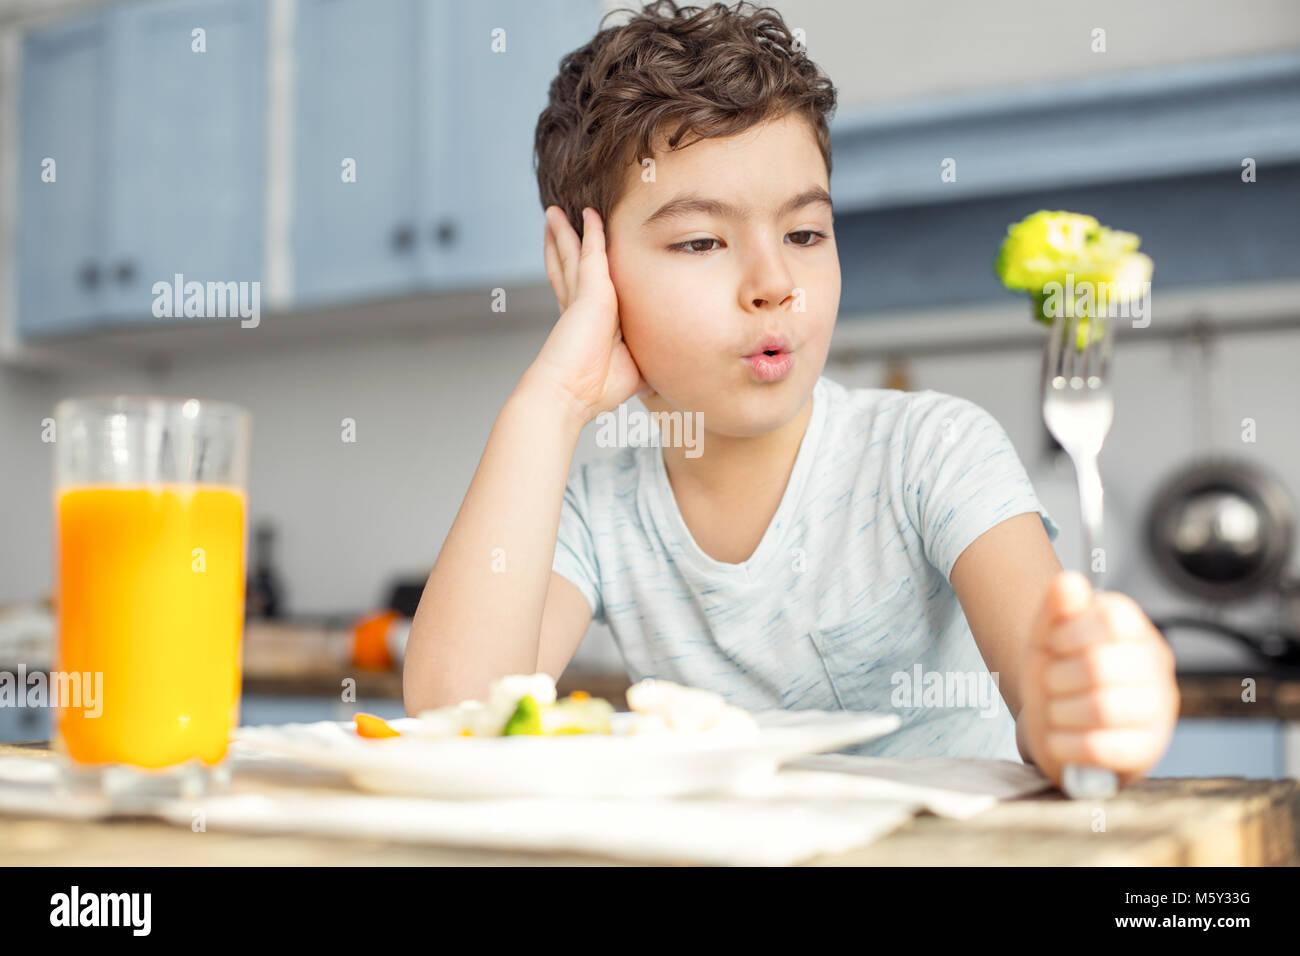 Sad boy eating vegetables for breakfast - Stock Image